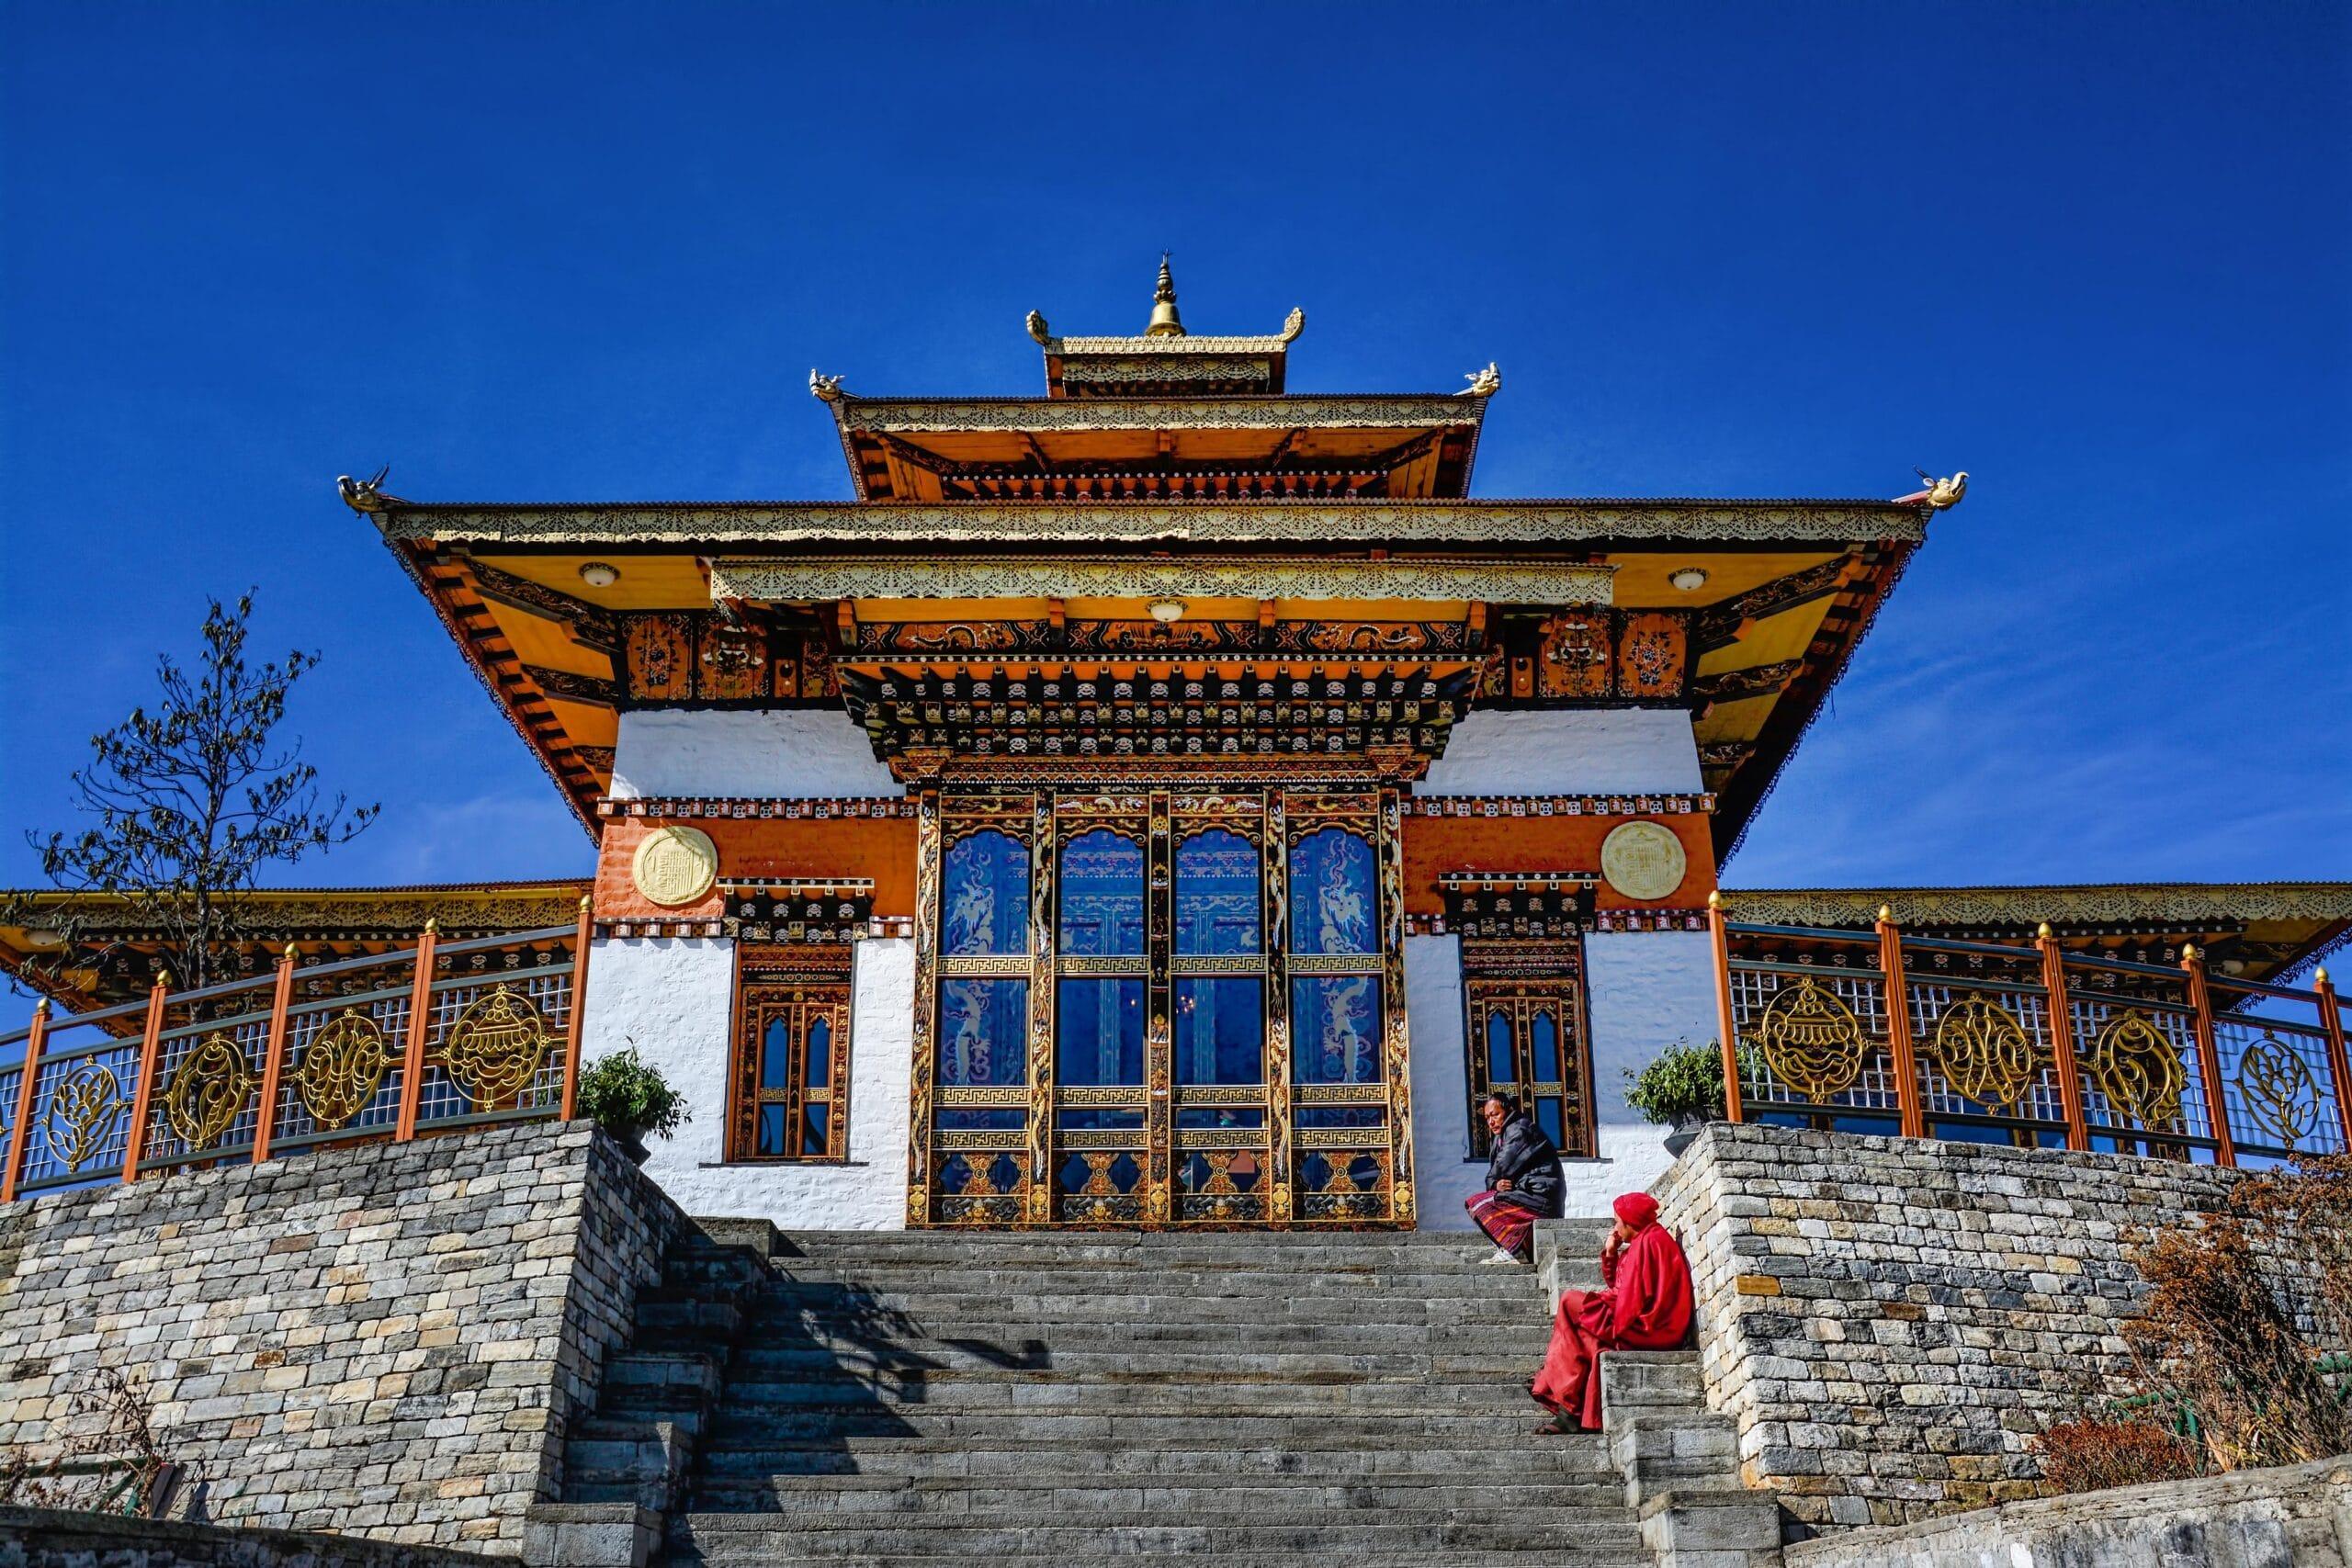 Druk Wangyal Lhakhang Temple